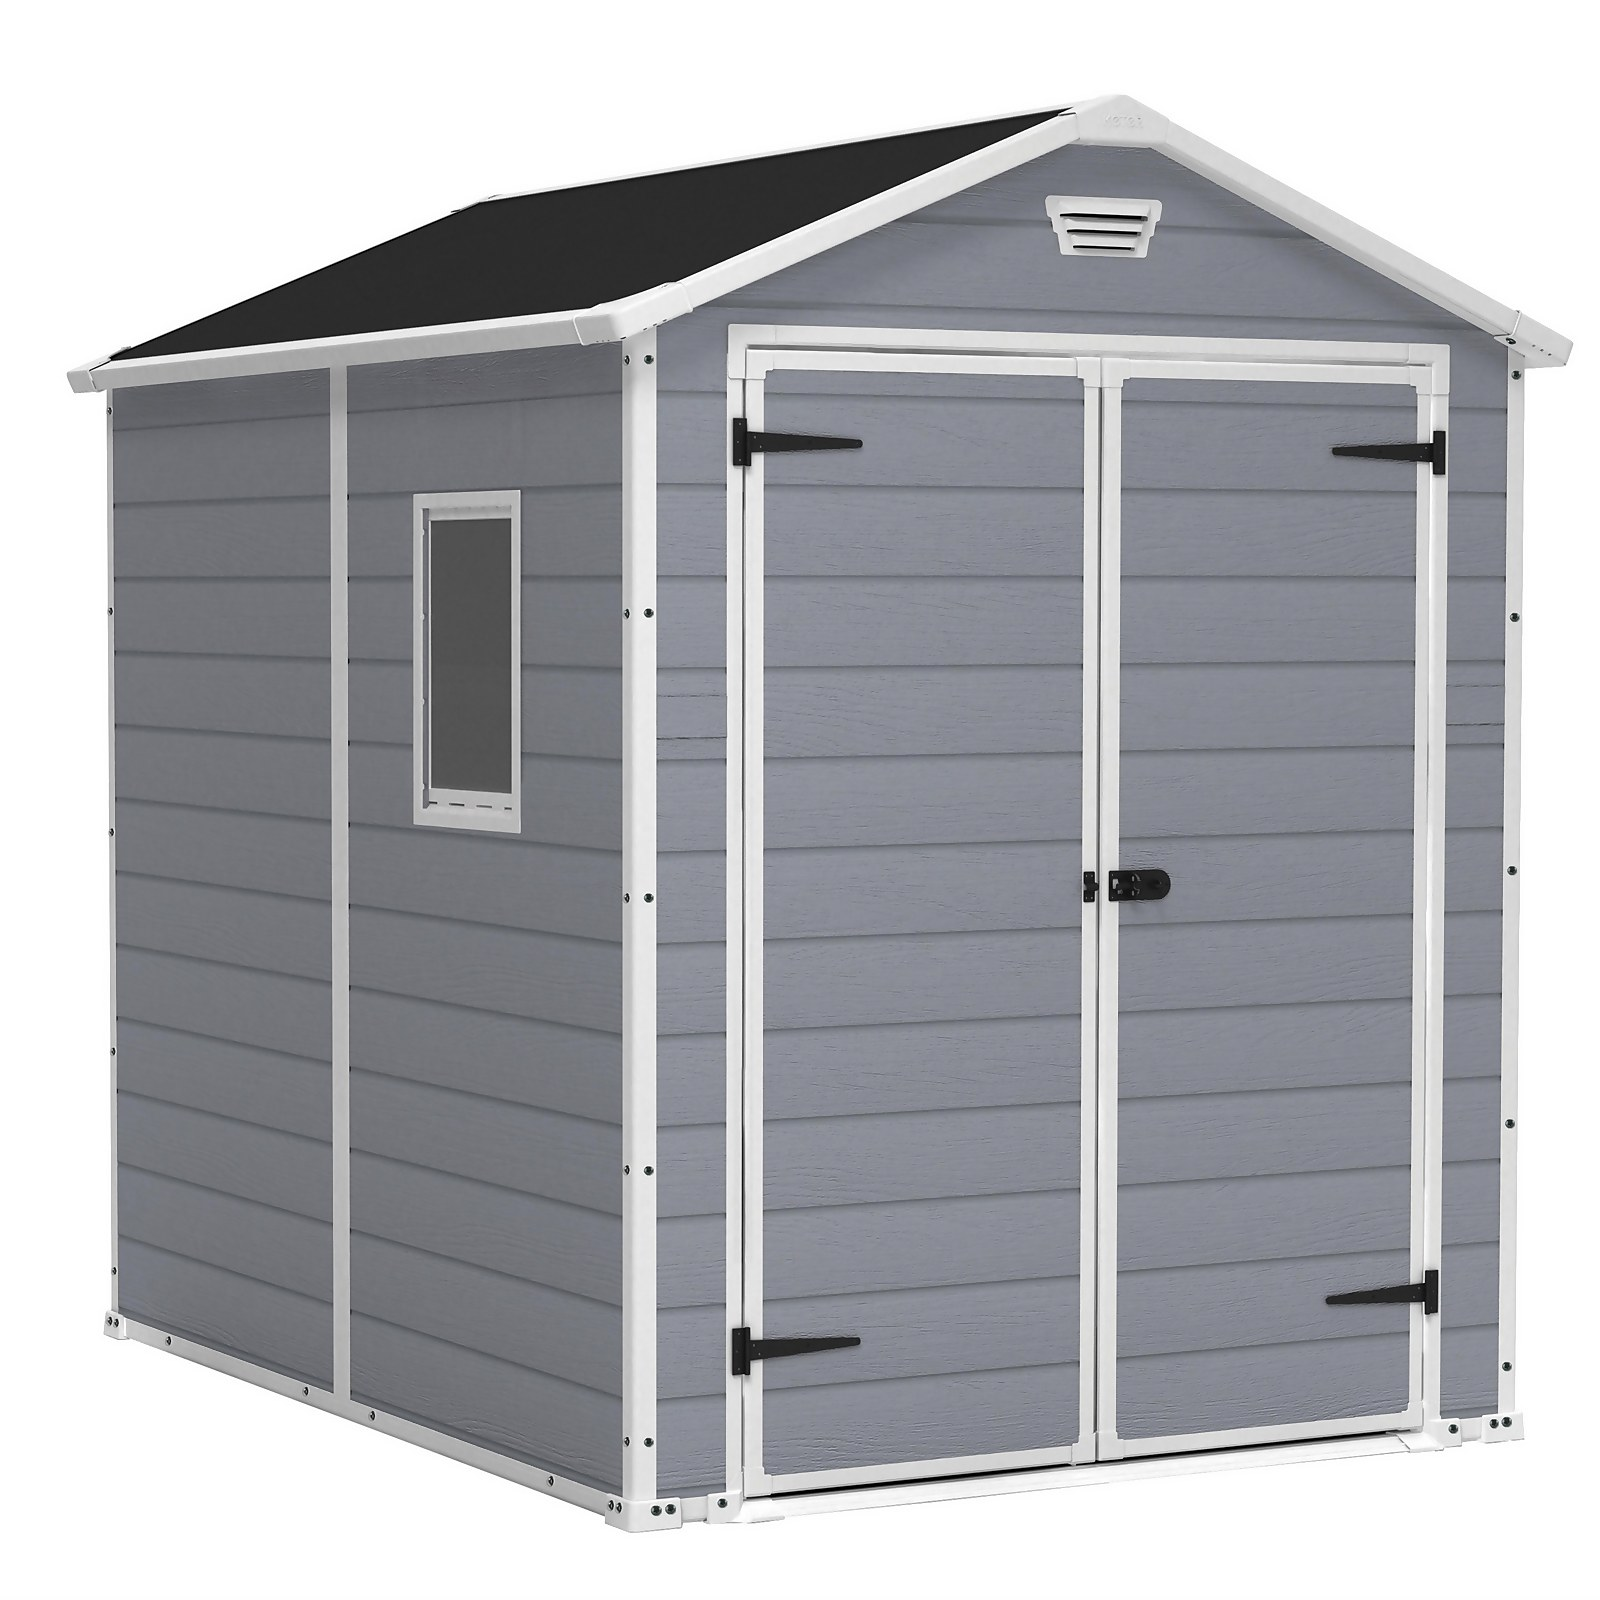 Keter Manor 6 x 8ft Outdoor Plastic Garden Storage Shed - Grey